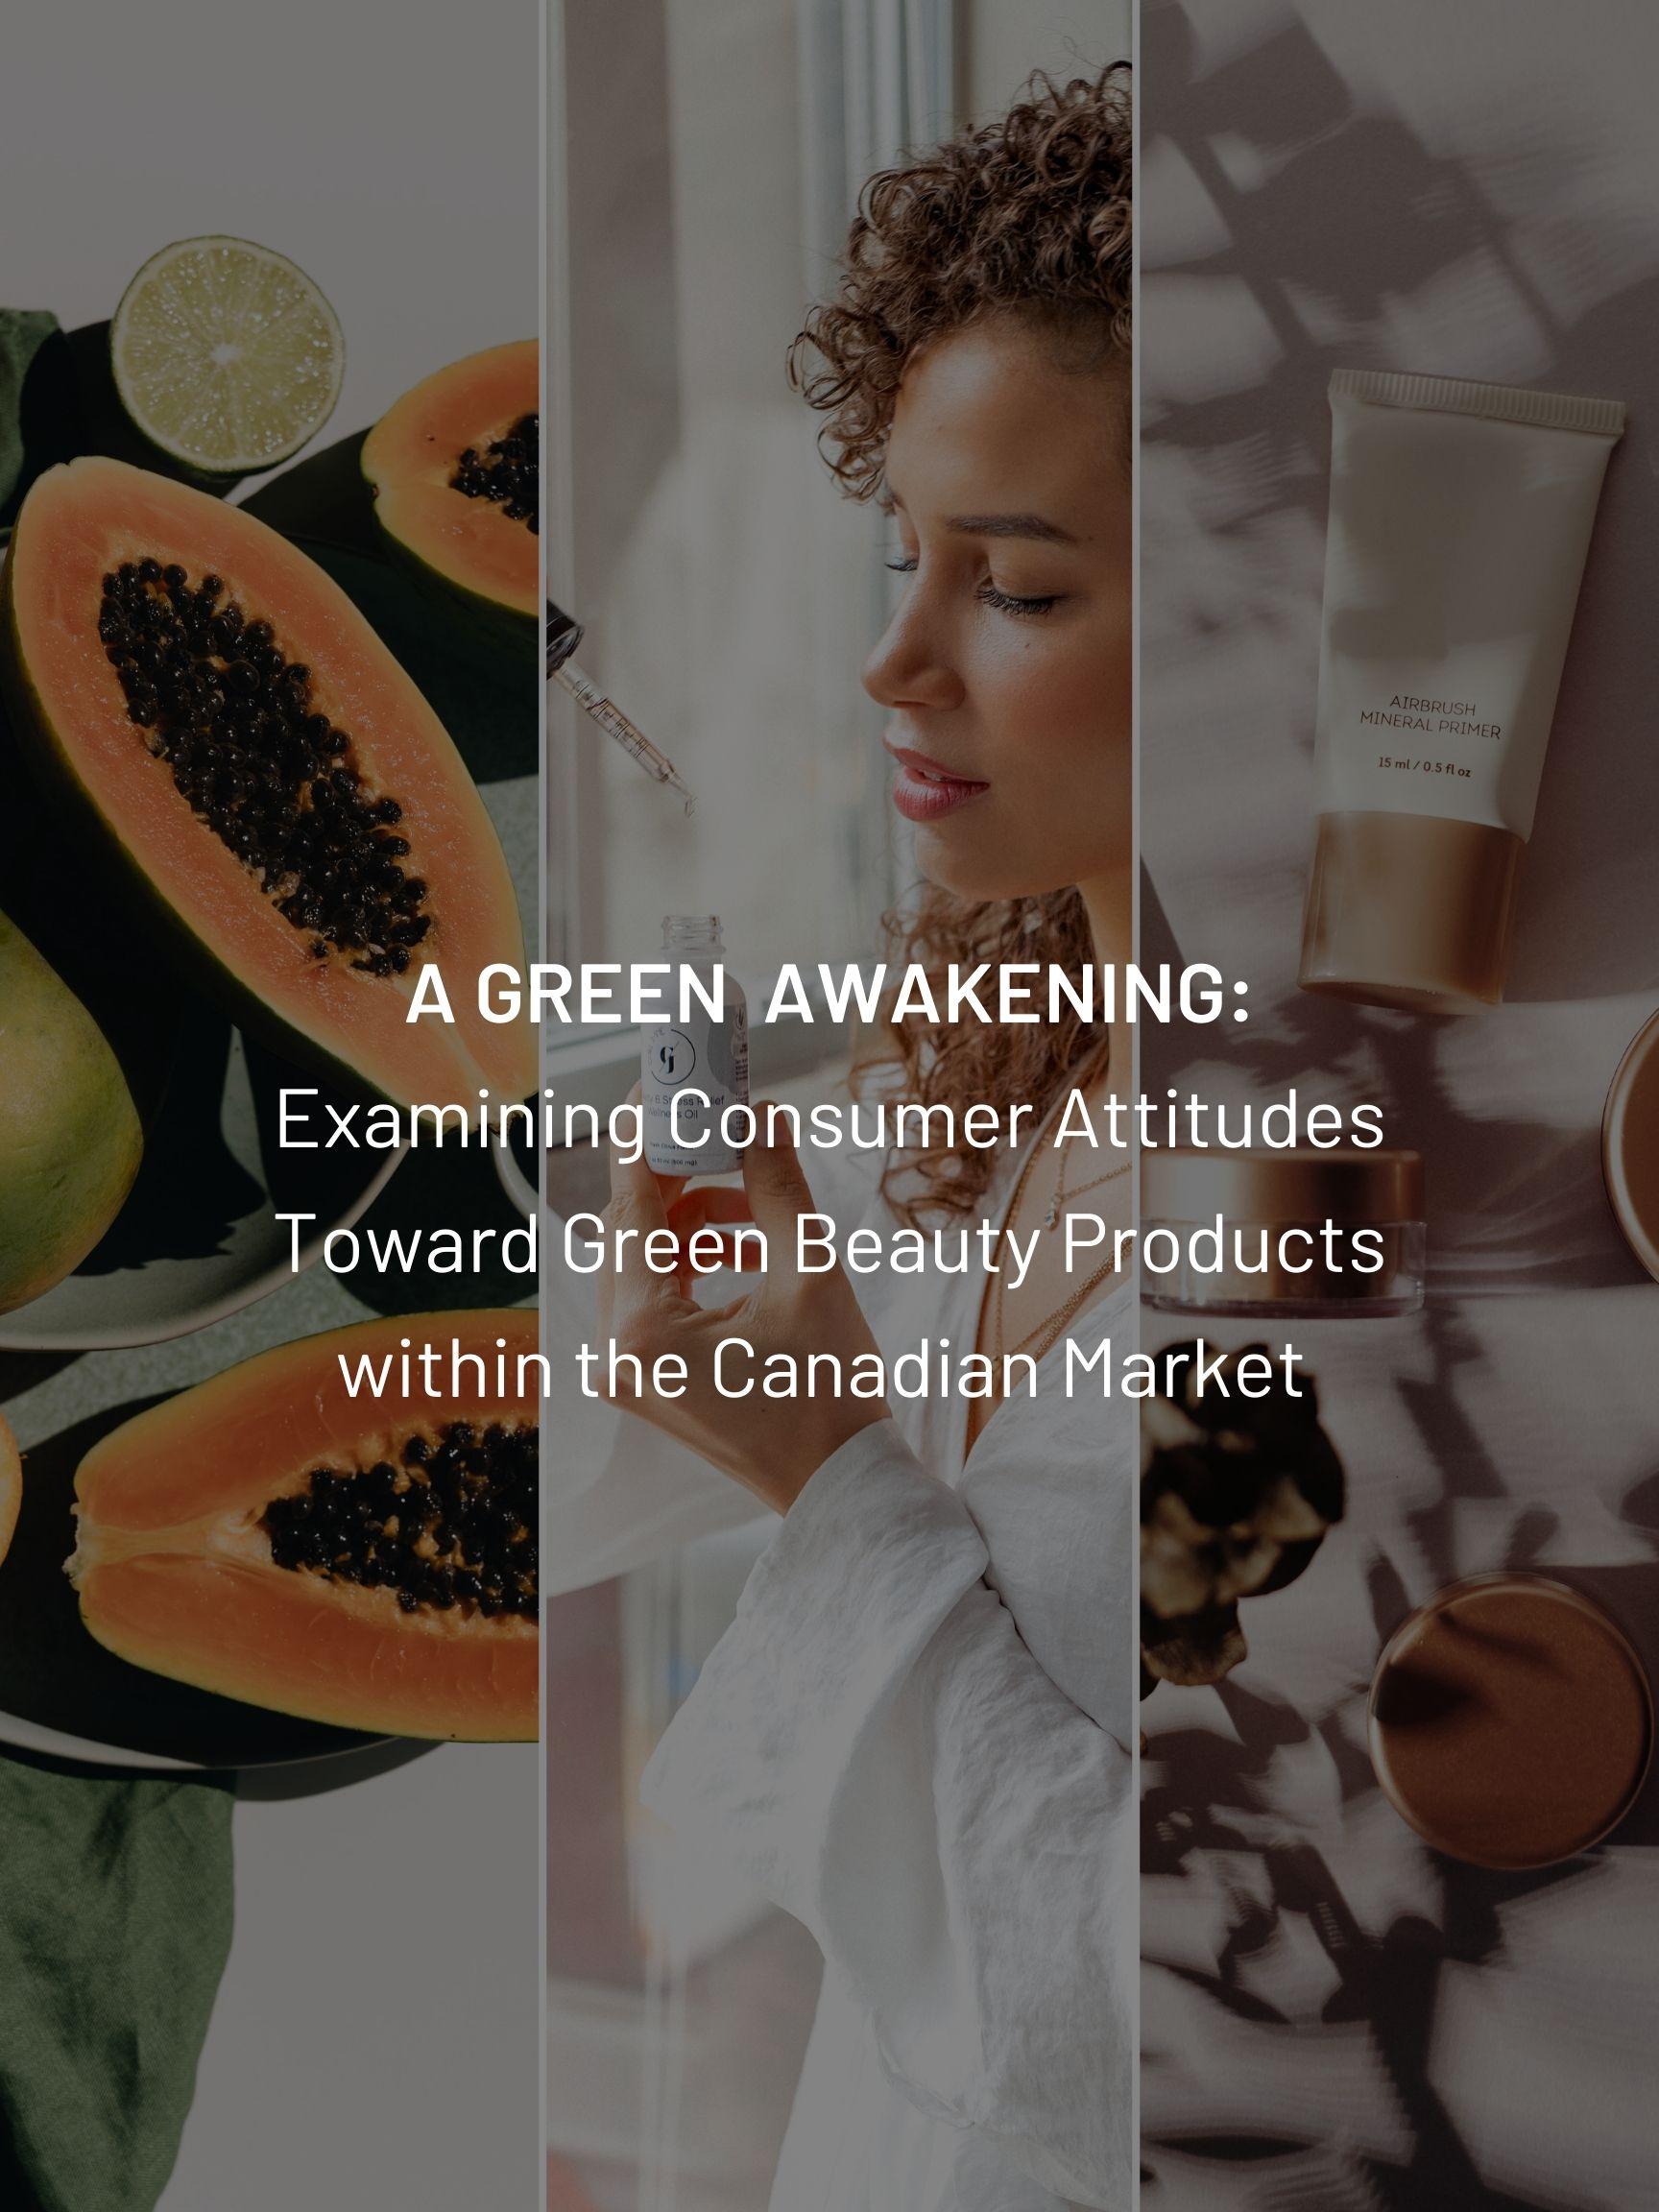 A Green Awakening:  Examining Consumer Attitudes Toward Green Beauty Products within the Canadian Market